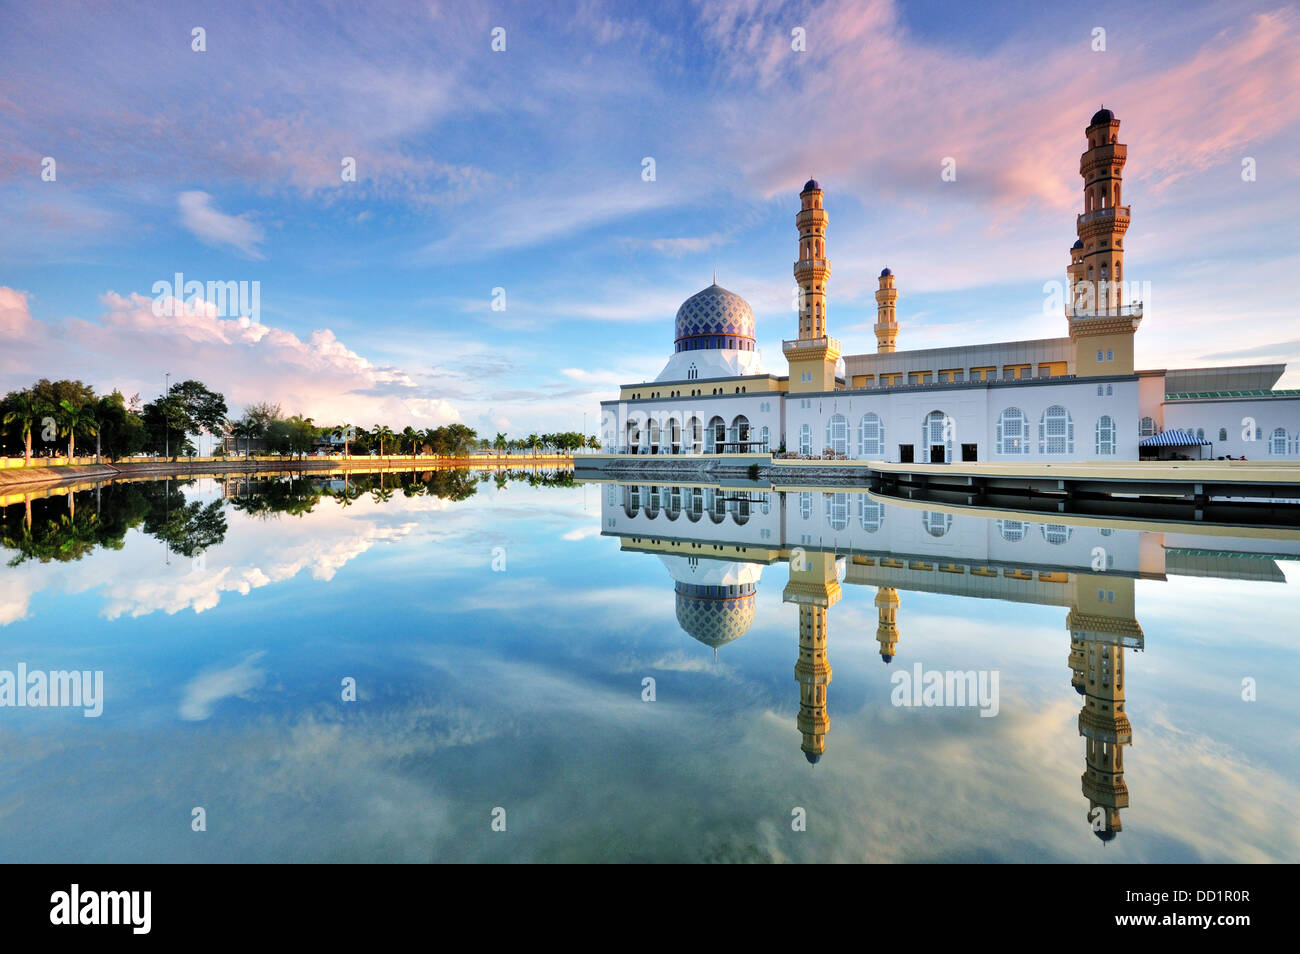 Kota Kinabalu Floating Mosque and Reflection - Stock Image